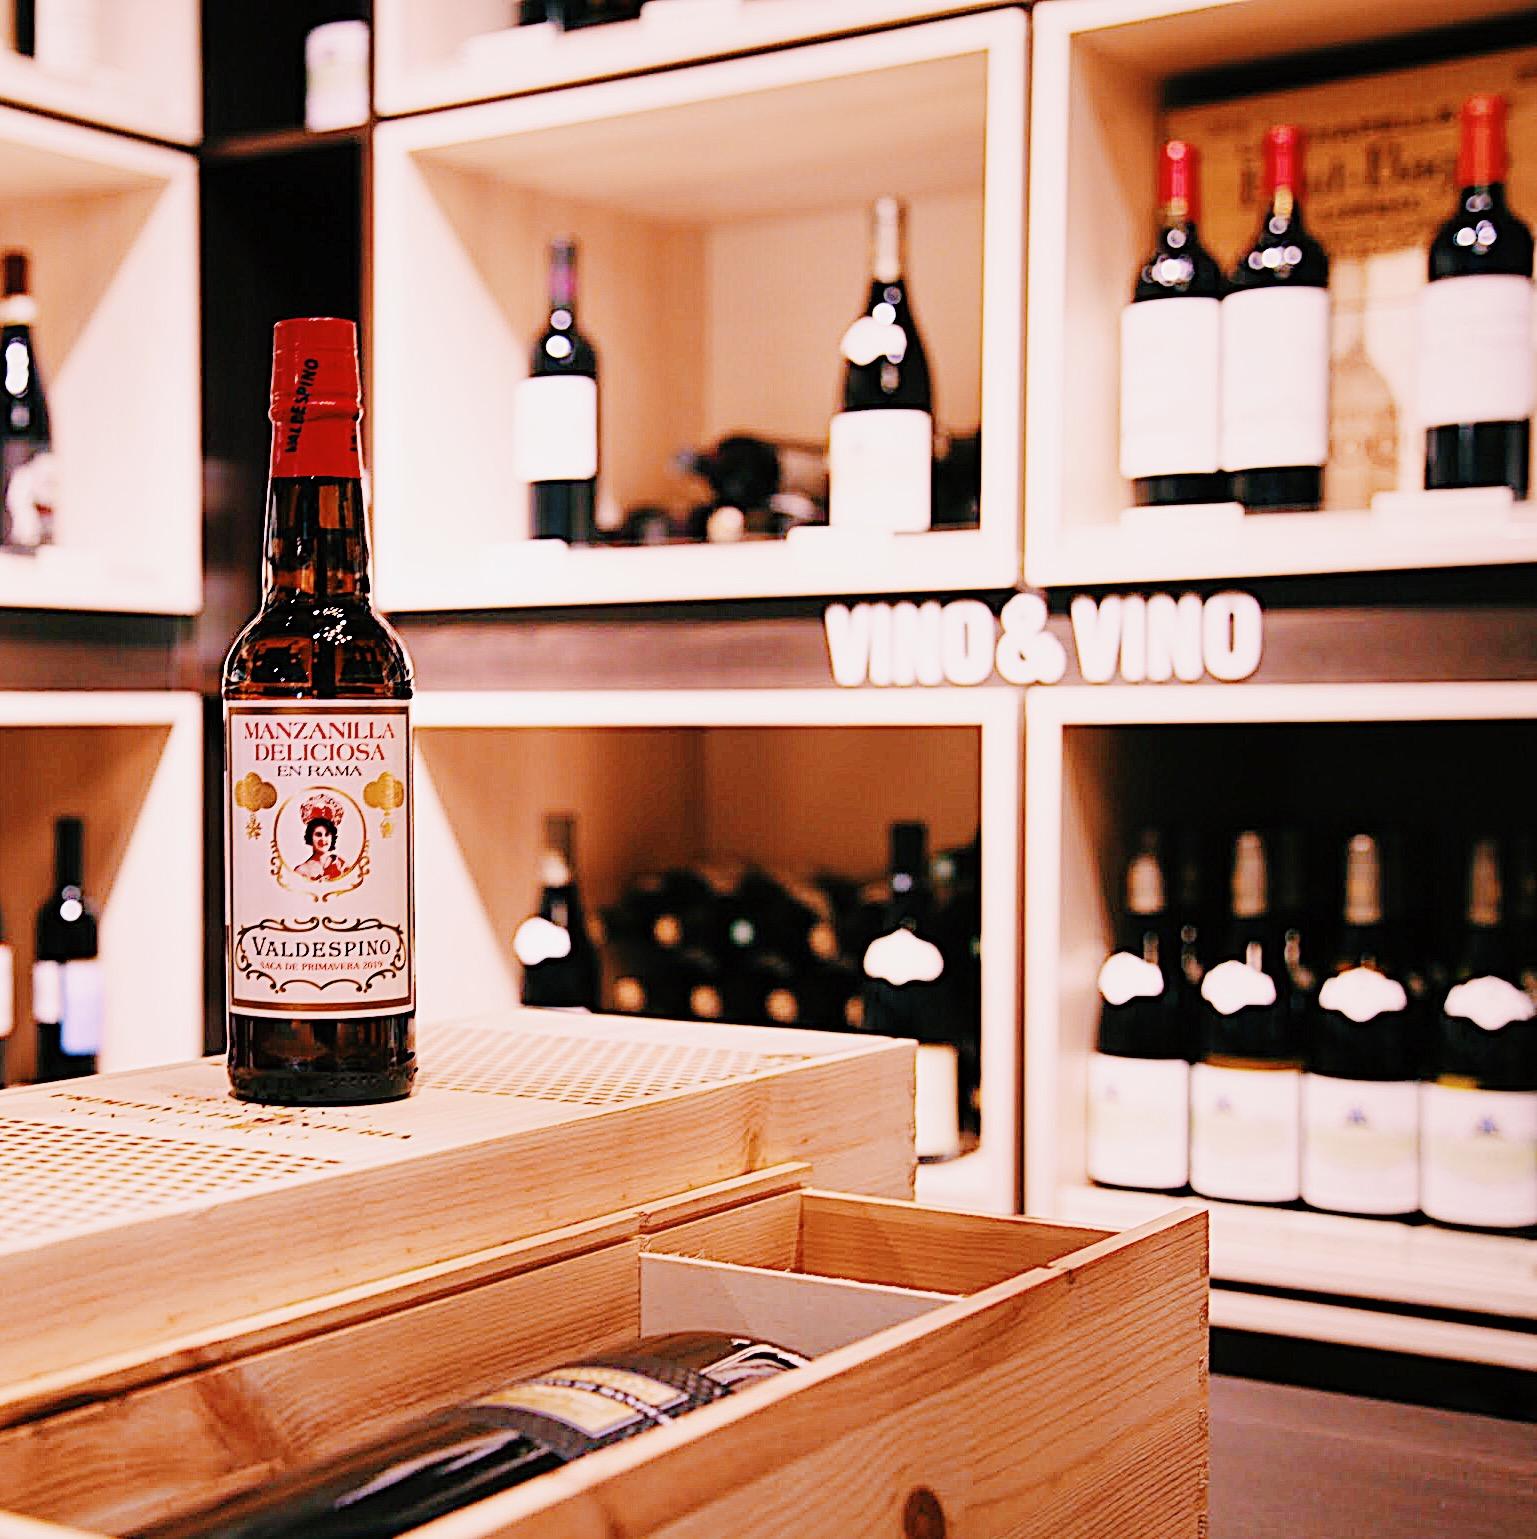 Valdespino - Manzanilla Wine 0.375